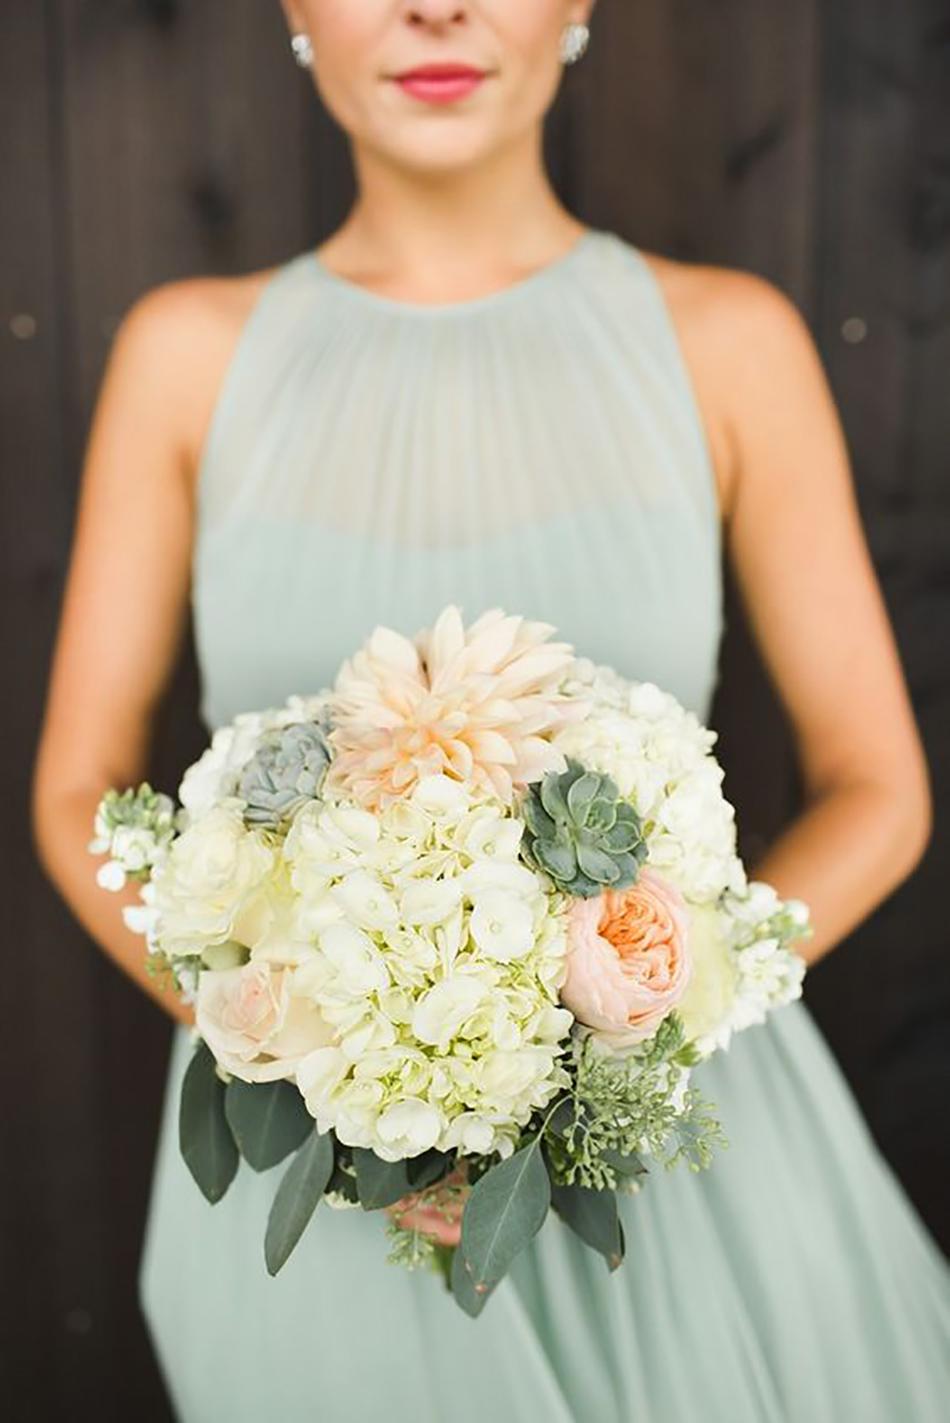 Wedding ideas by colour: pastel green wedding dress